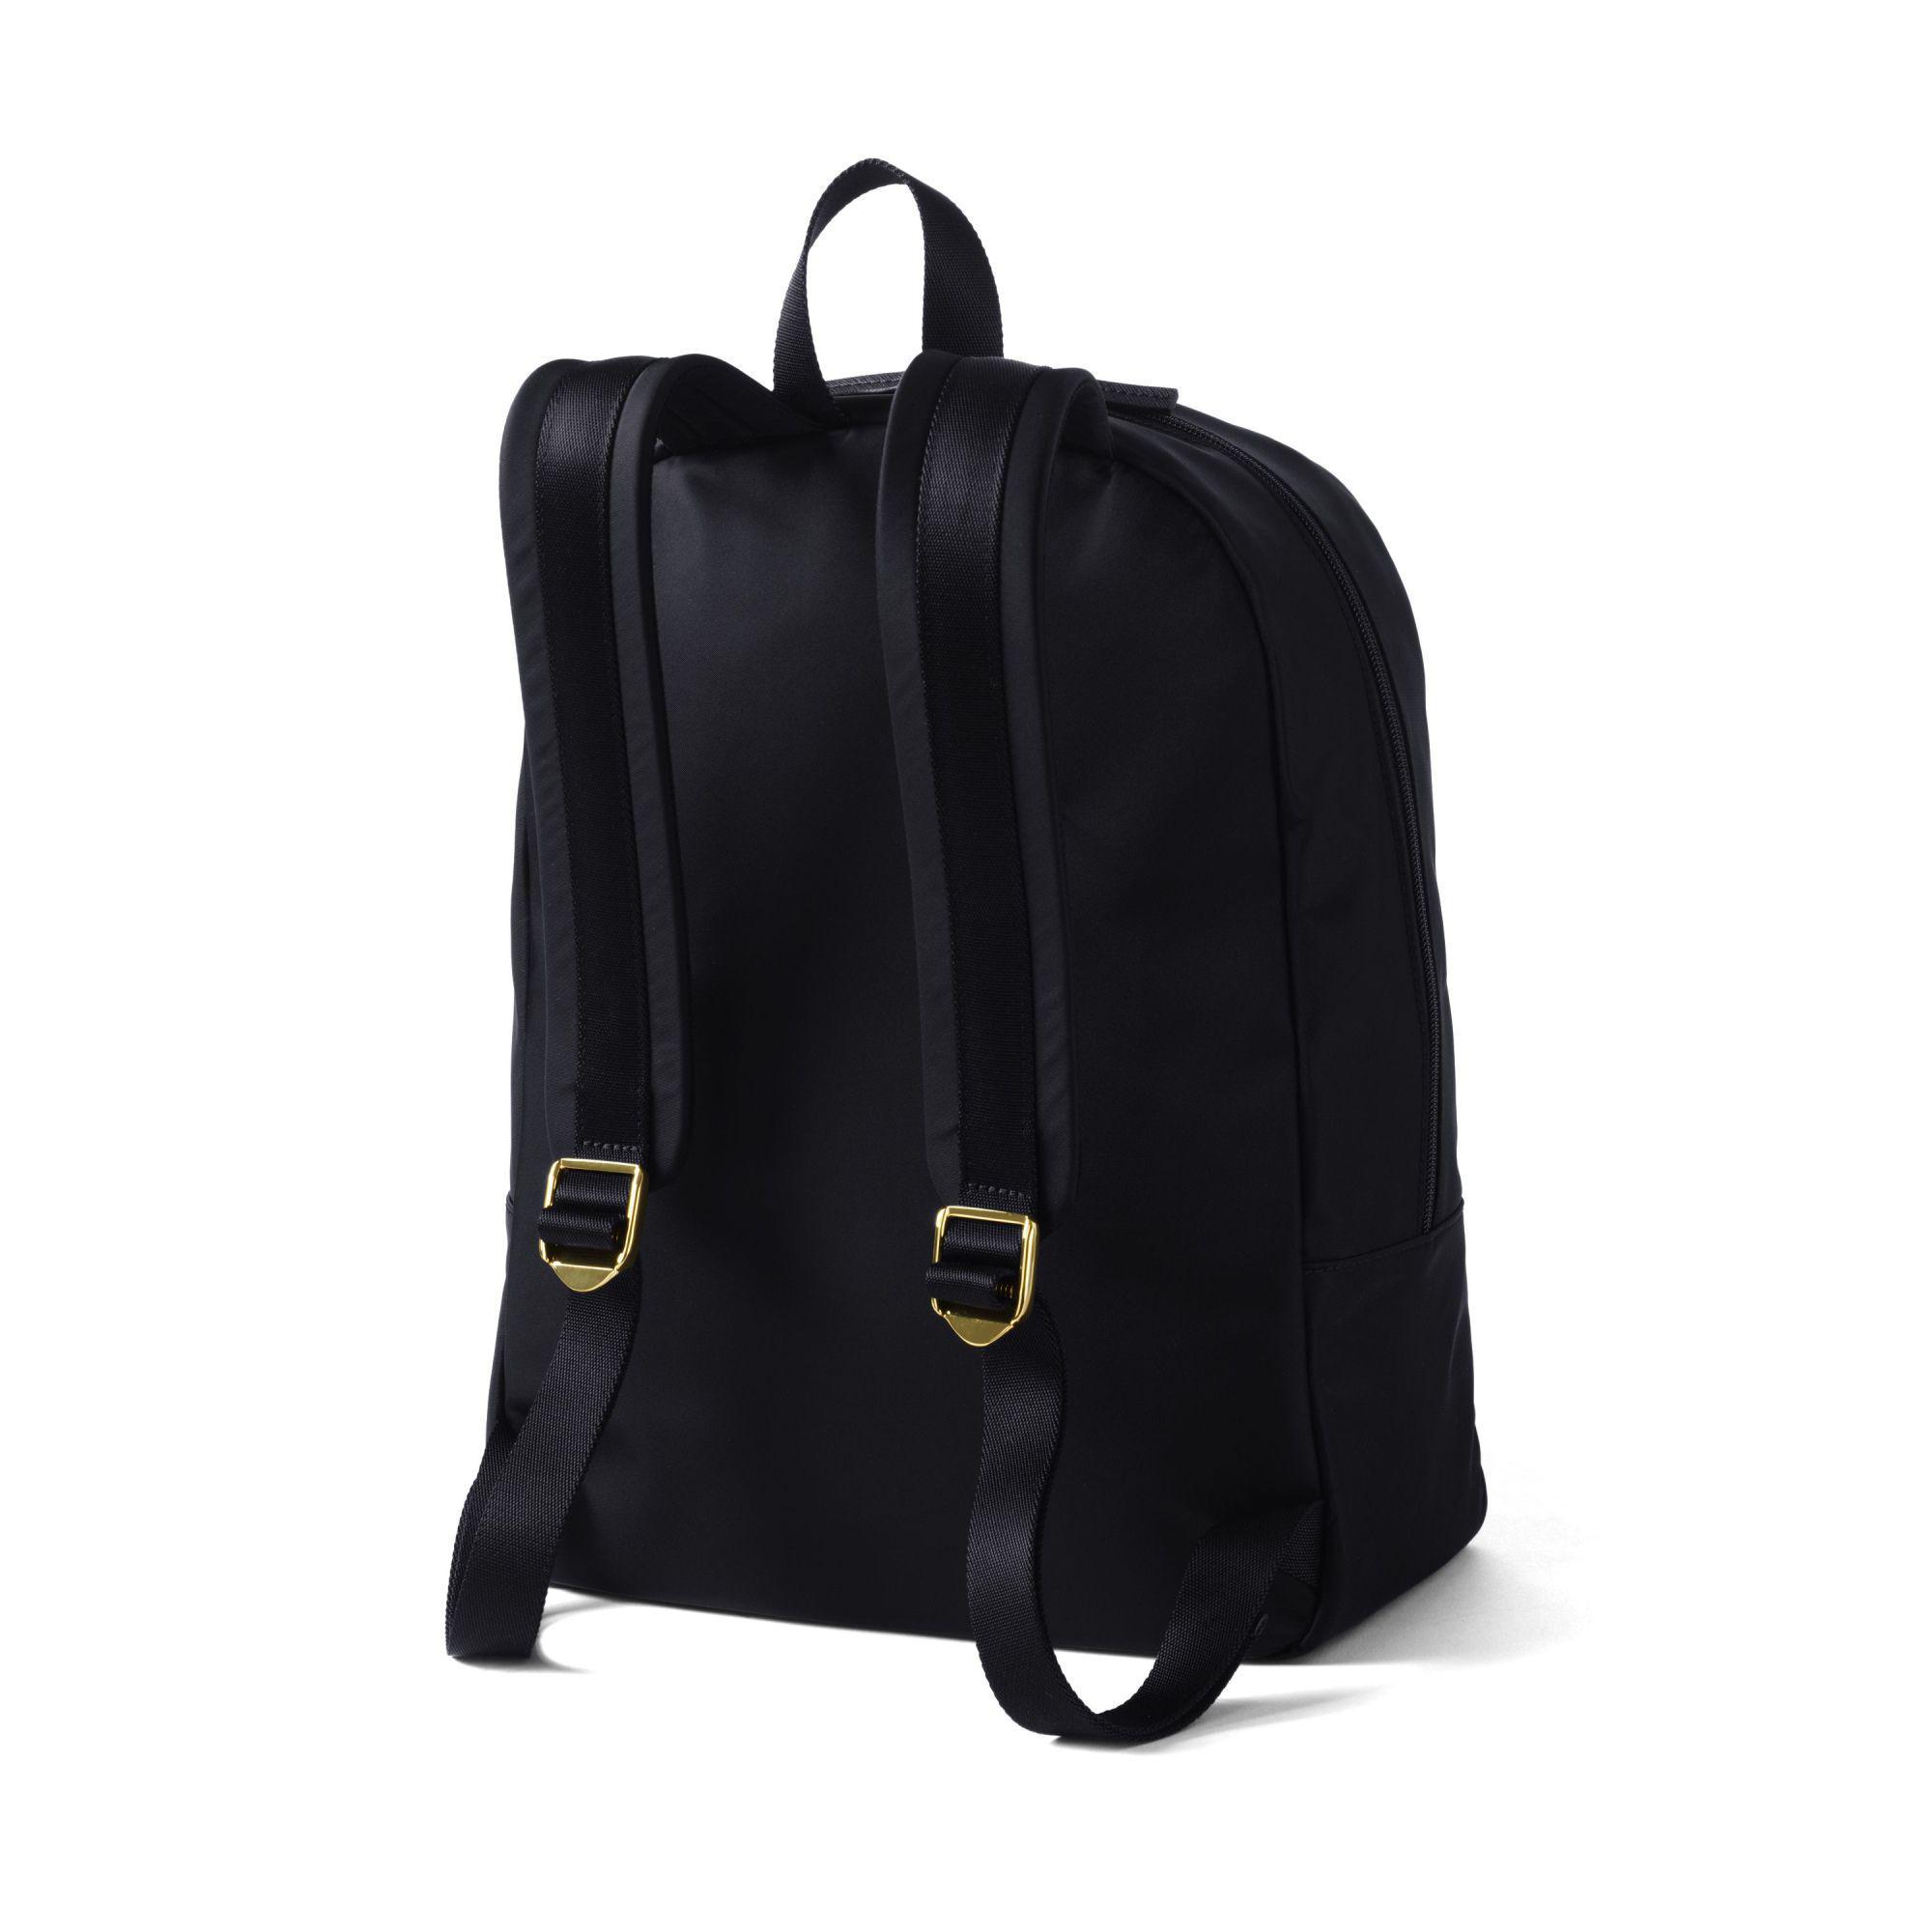 Lands' End Synthetic Black Nylon Backpack